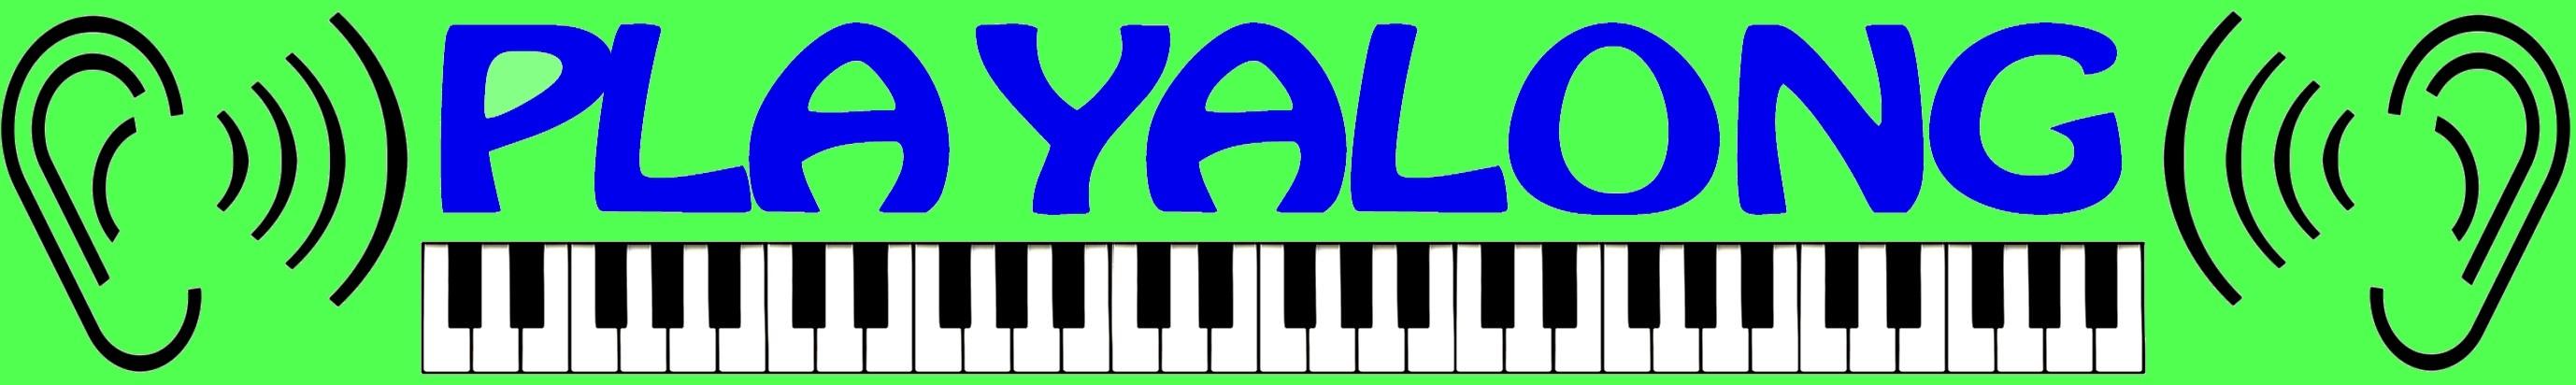 Playalong-Mitspielvideo Thumbnail-Symbol grün blau schmal